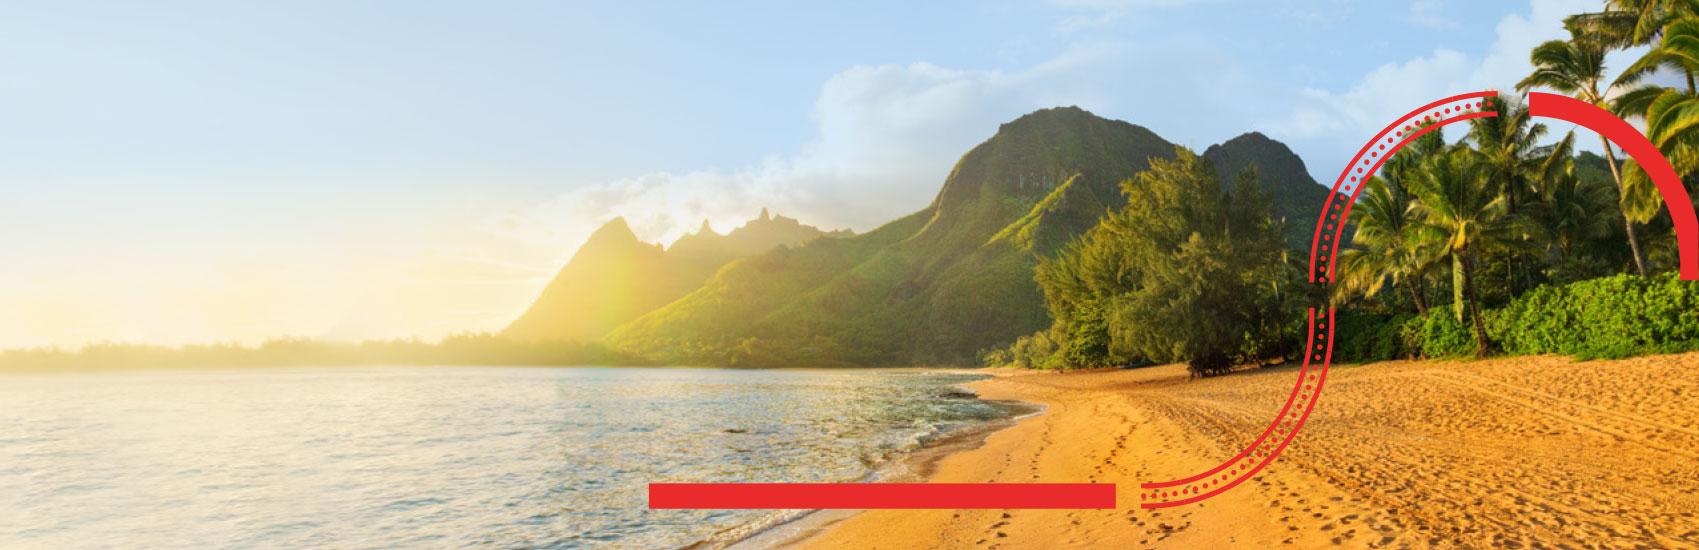 Save the Taxes on Hawaii 0